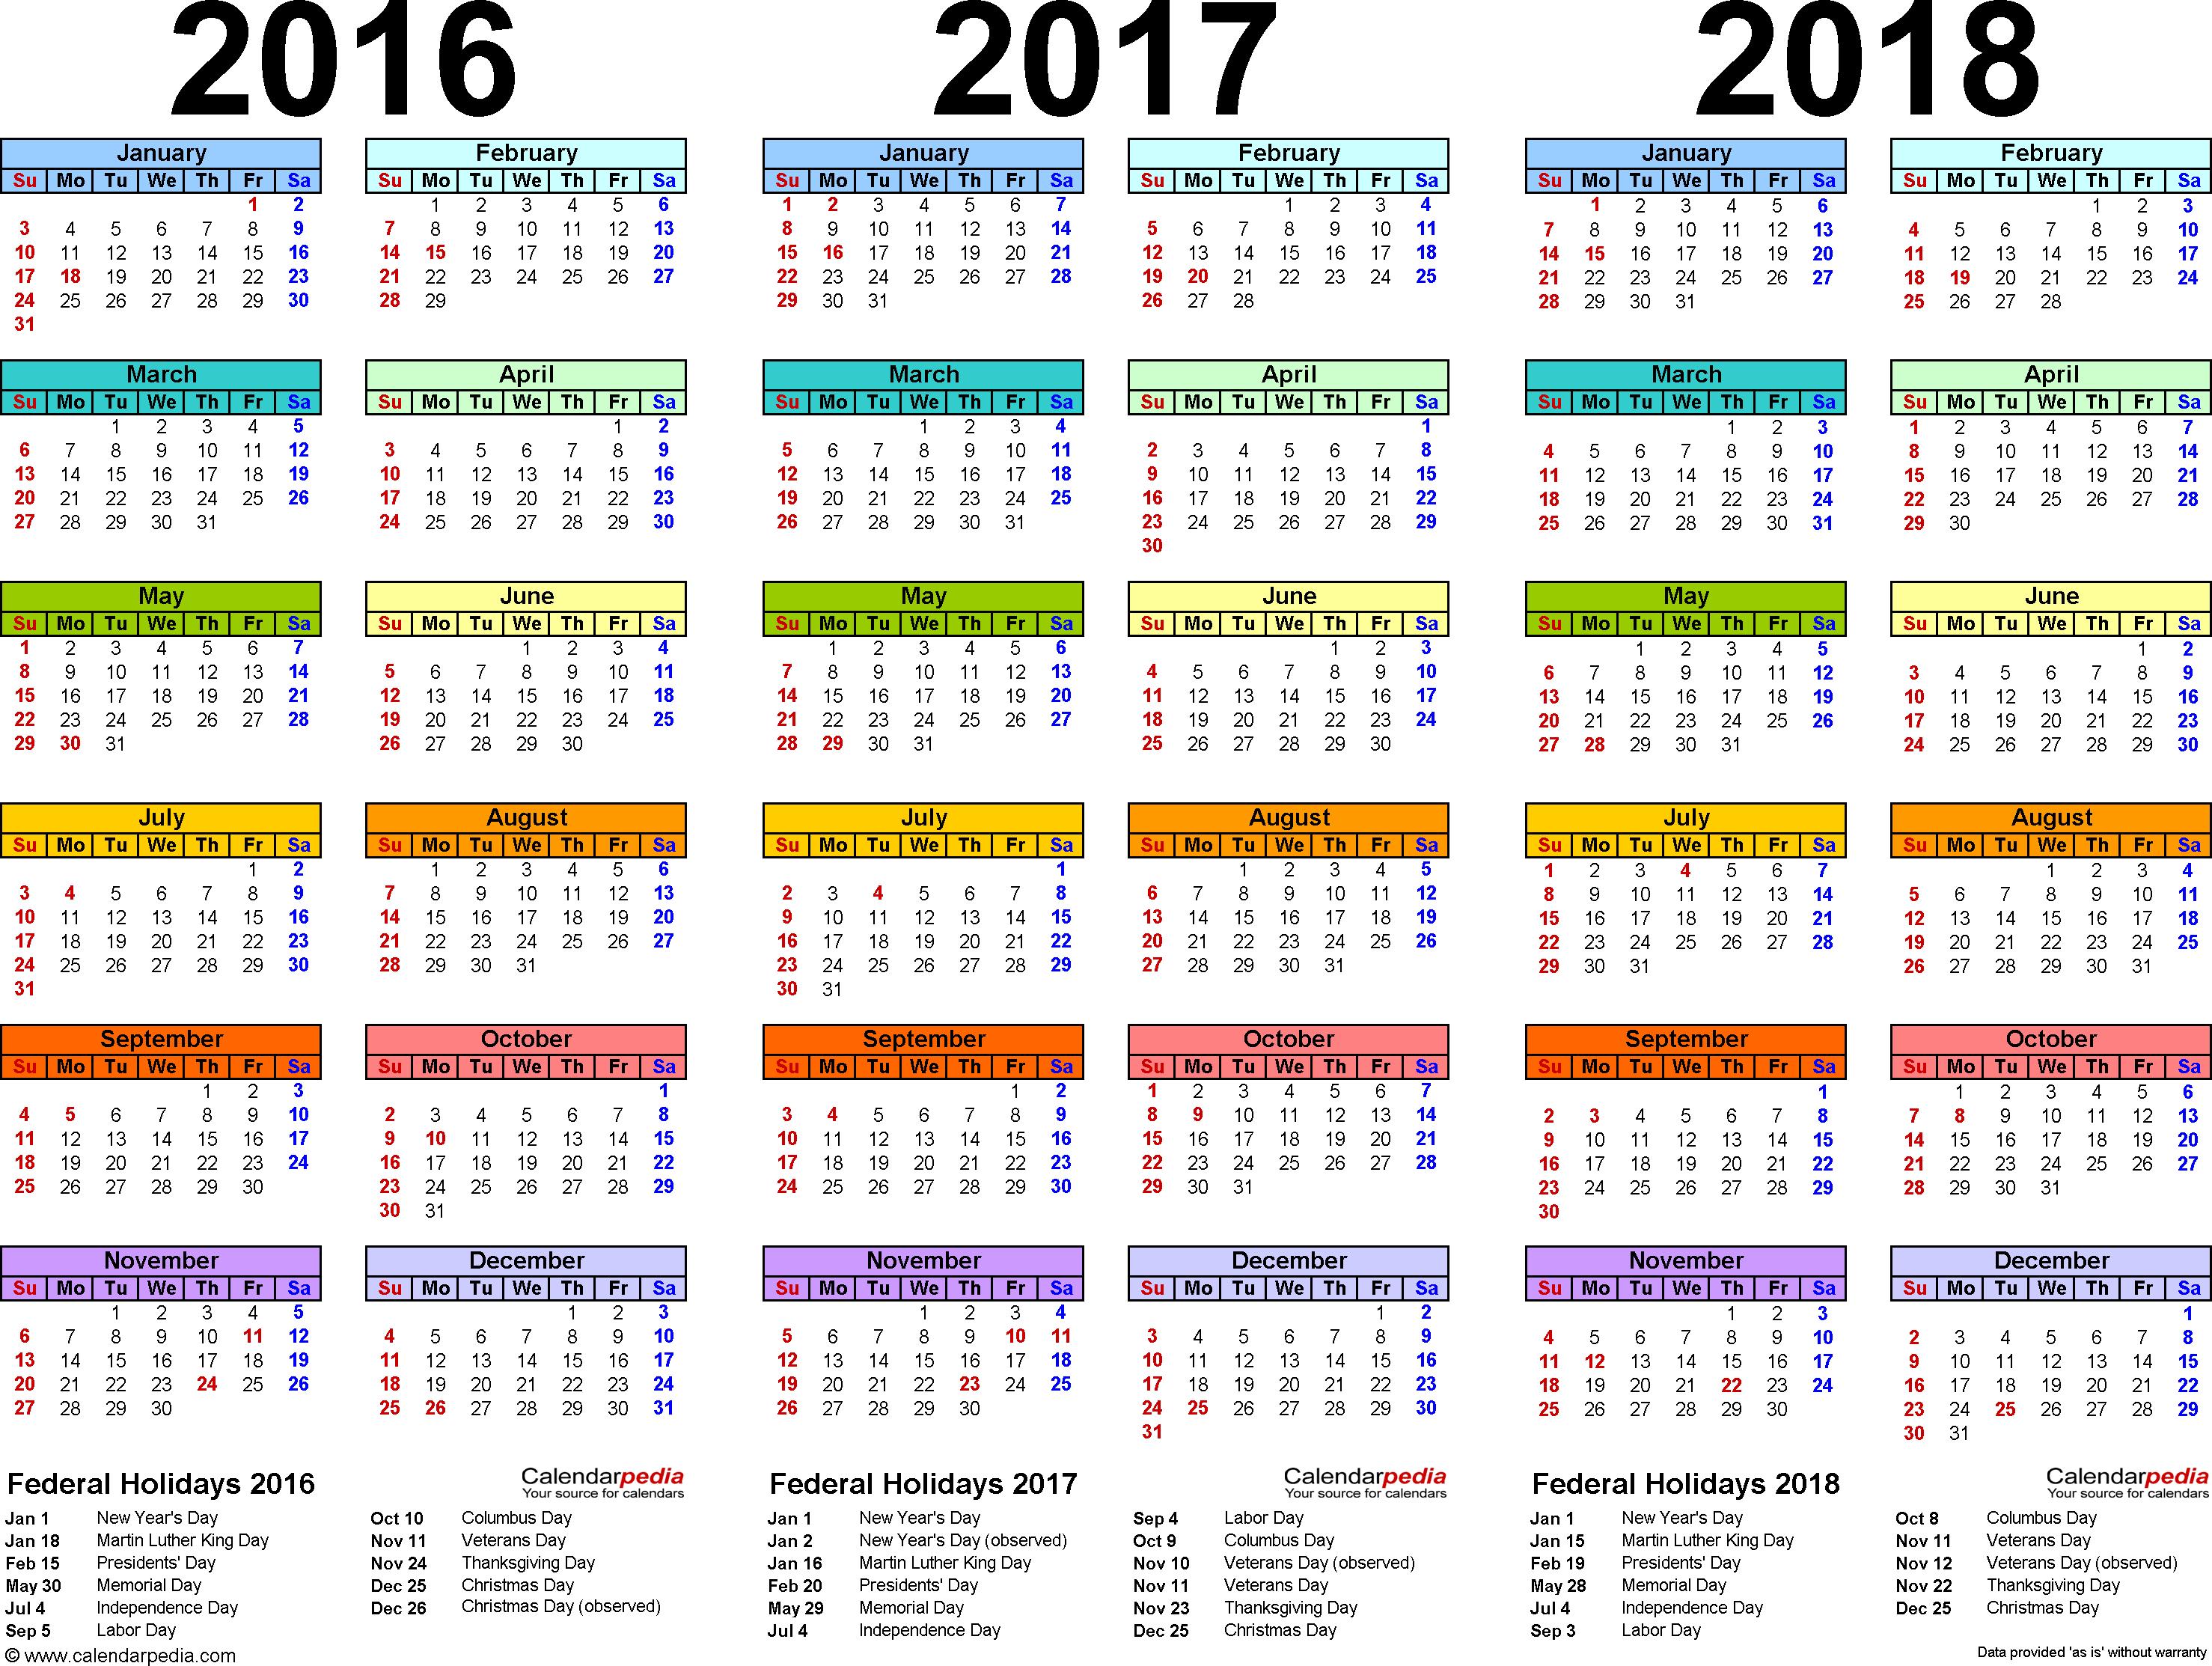 2016/2017/2018 calendar 4 three year printable PDF calendars